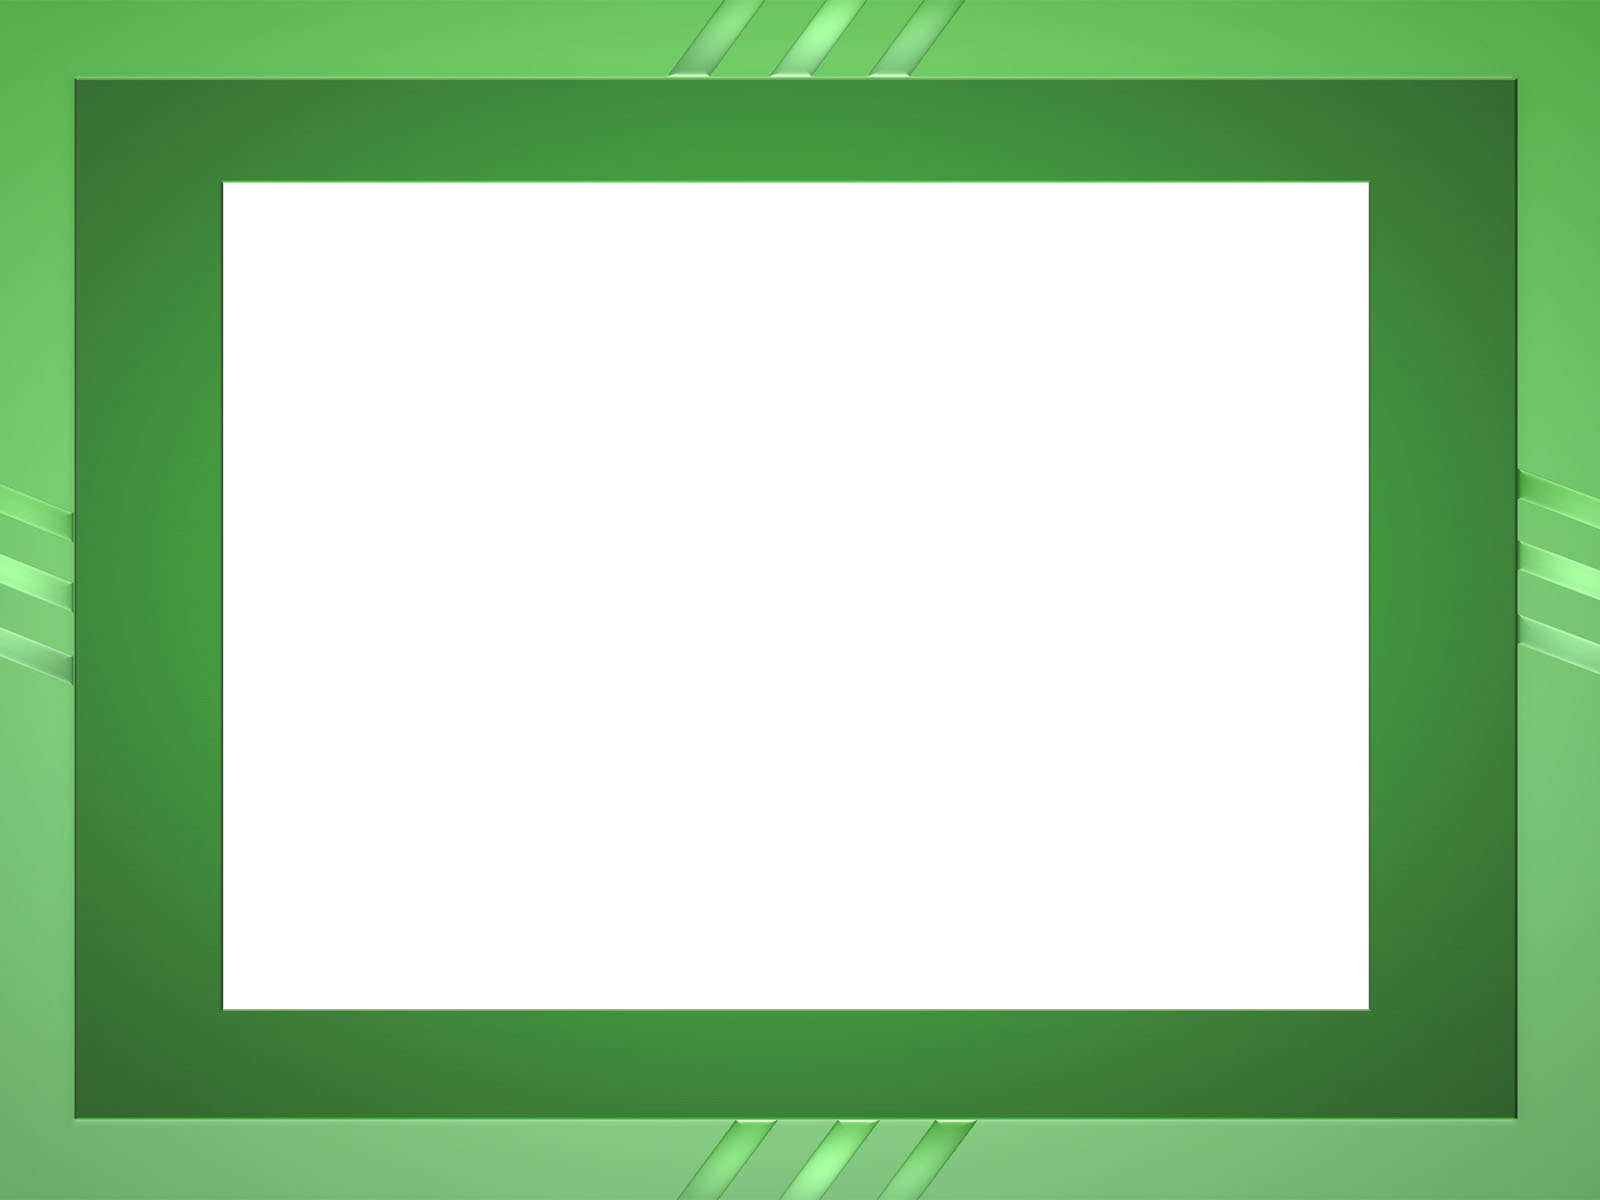 Green Frame Backgrounds   Border & Frames, Green Templates   Free ...